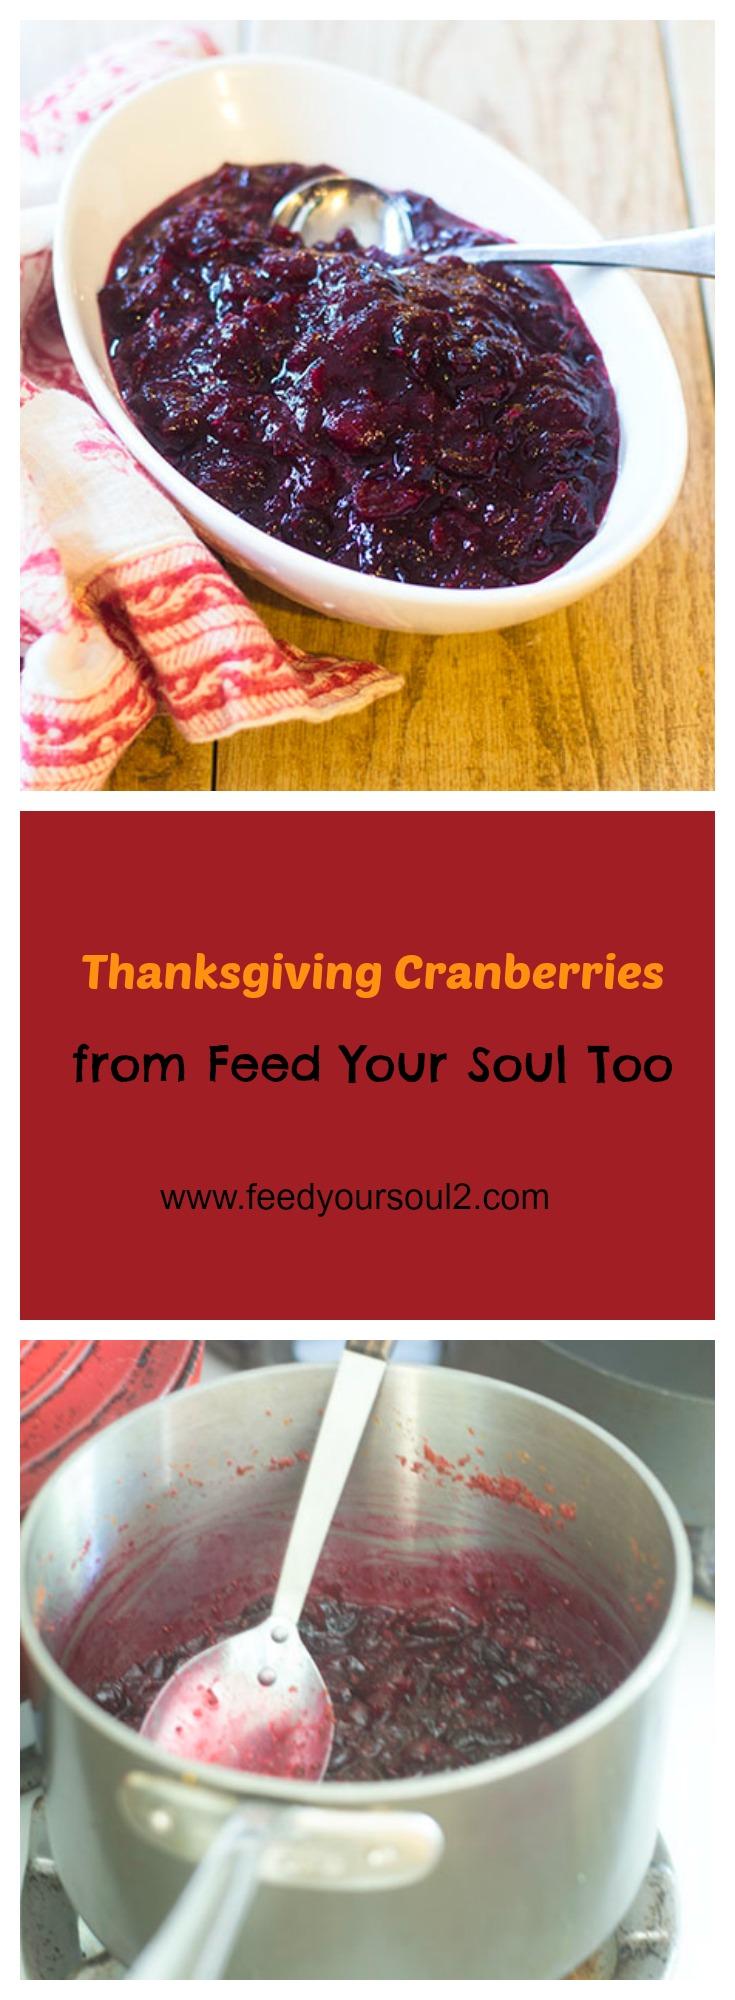 Thanksgiving Whole Cranberry Relish #Thanksgiving #sidedish #cranberries | feedyoursoul2.com